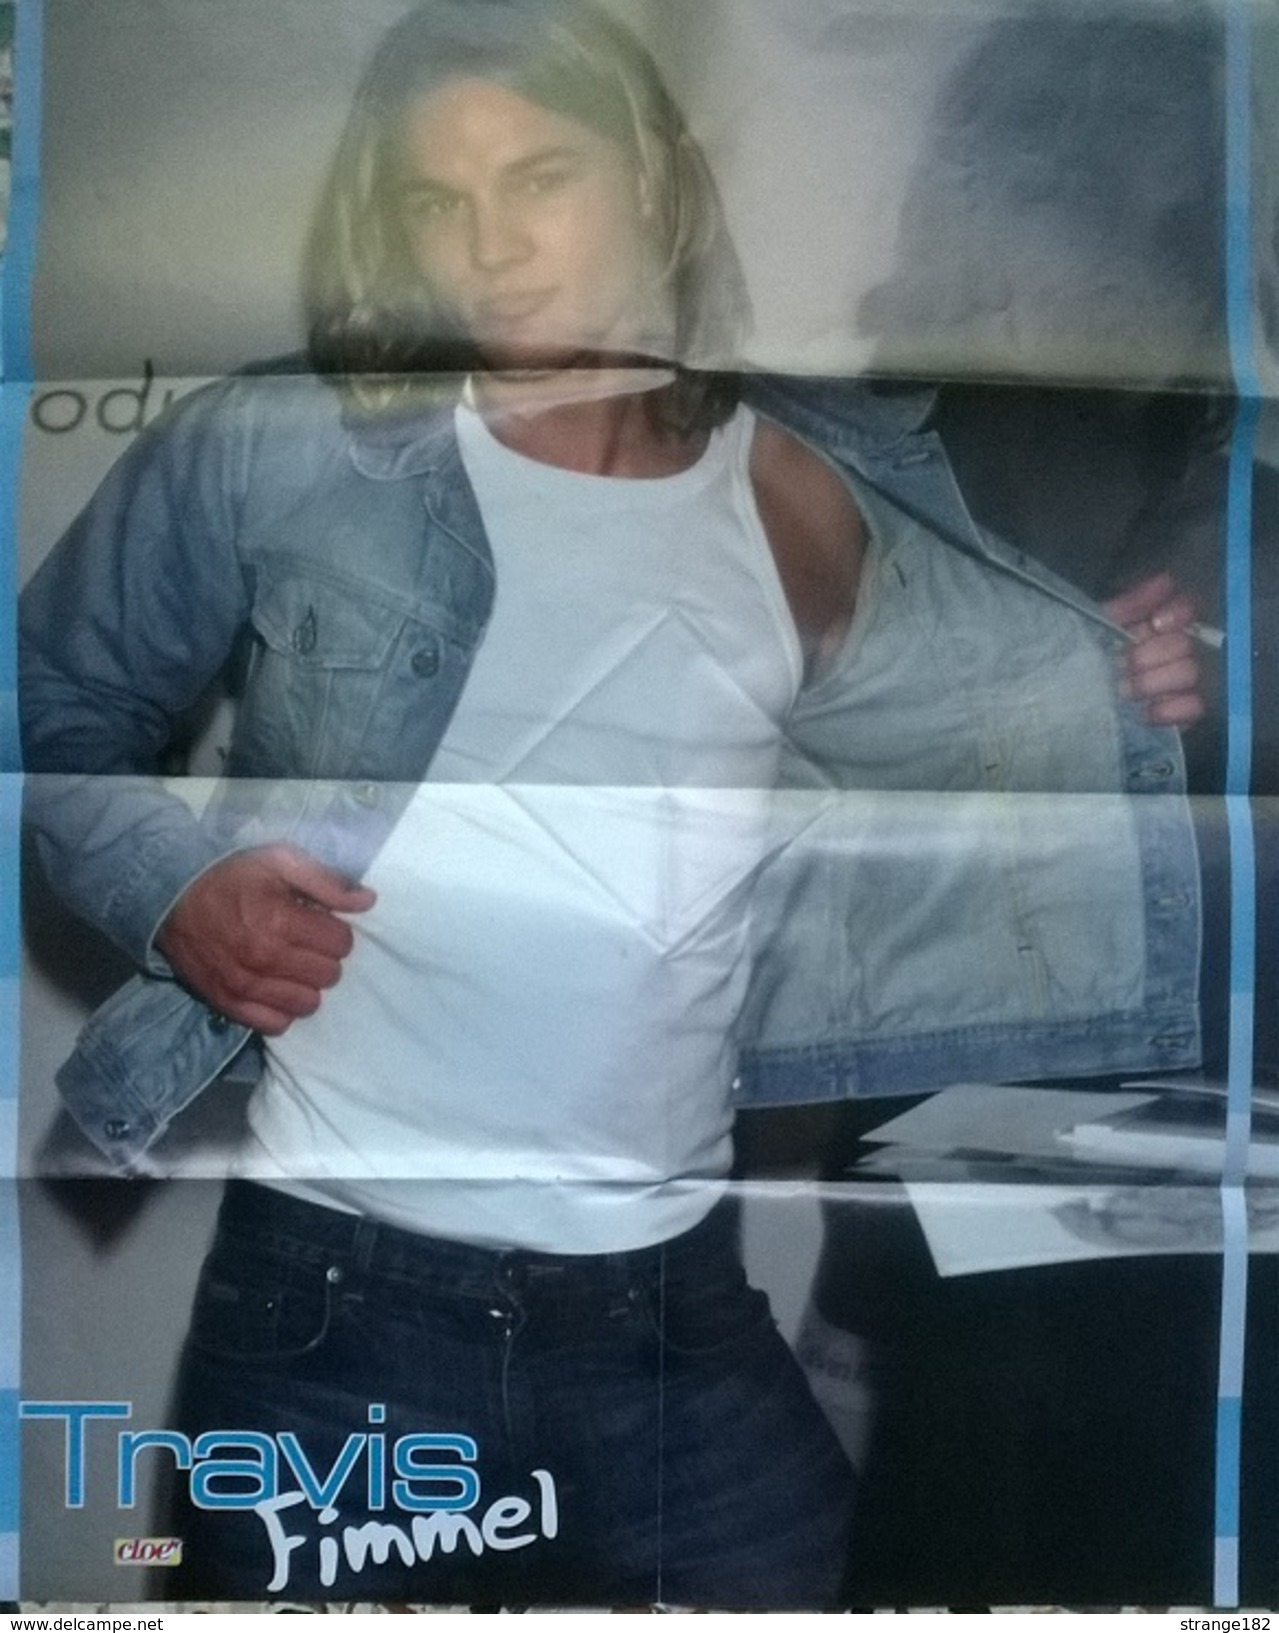 POSTER DUNCAN JAMES/TRAVIS FIMMEL - Manifesti & Poster